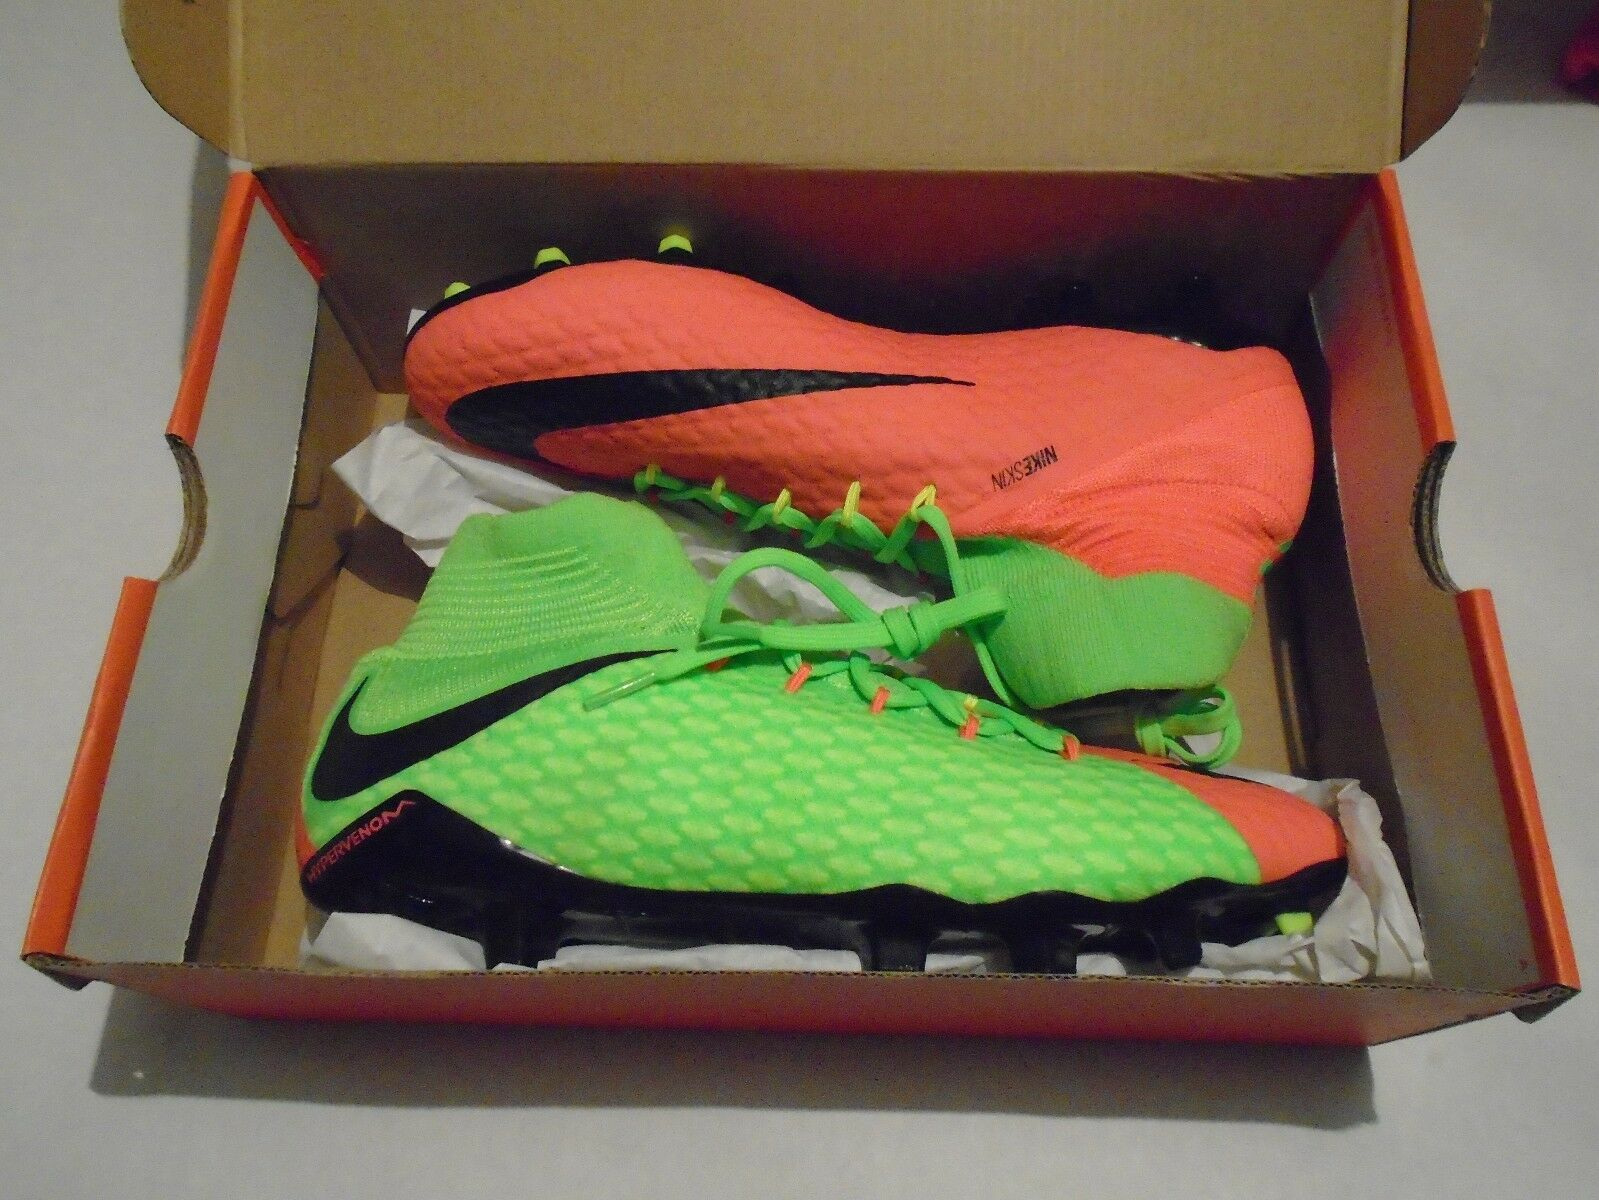 Nuevo FG en caja Nike hypervenom phatal III DF FG Nuevo hombre soccer cleats 852554-308 8e2c4a